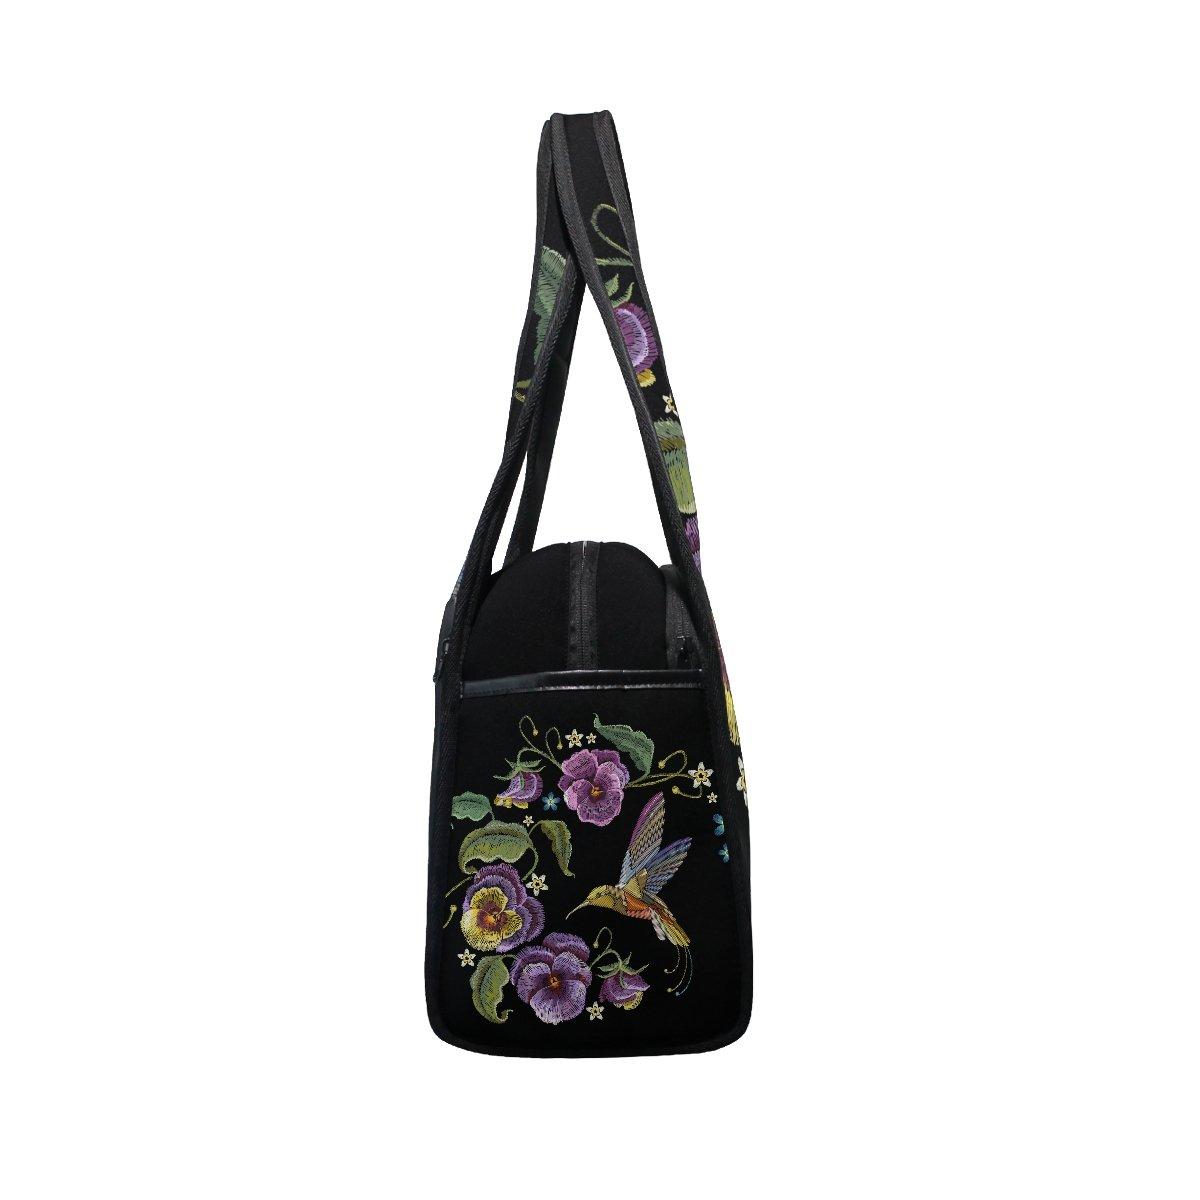 AHOMY Sports Gym Bag Flower Leaf Hummingbirds Embroidery Duffel Bag Travel Shoulder Bag